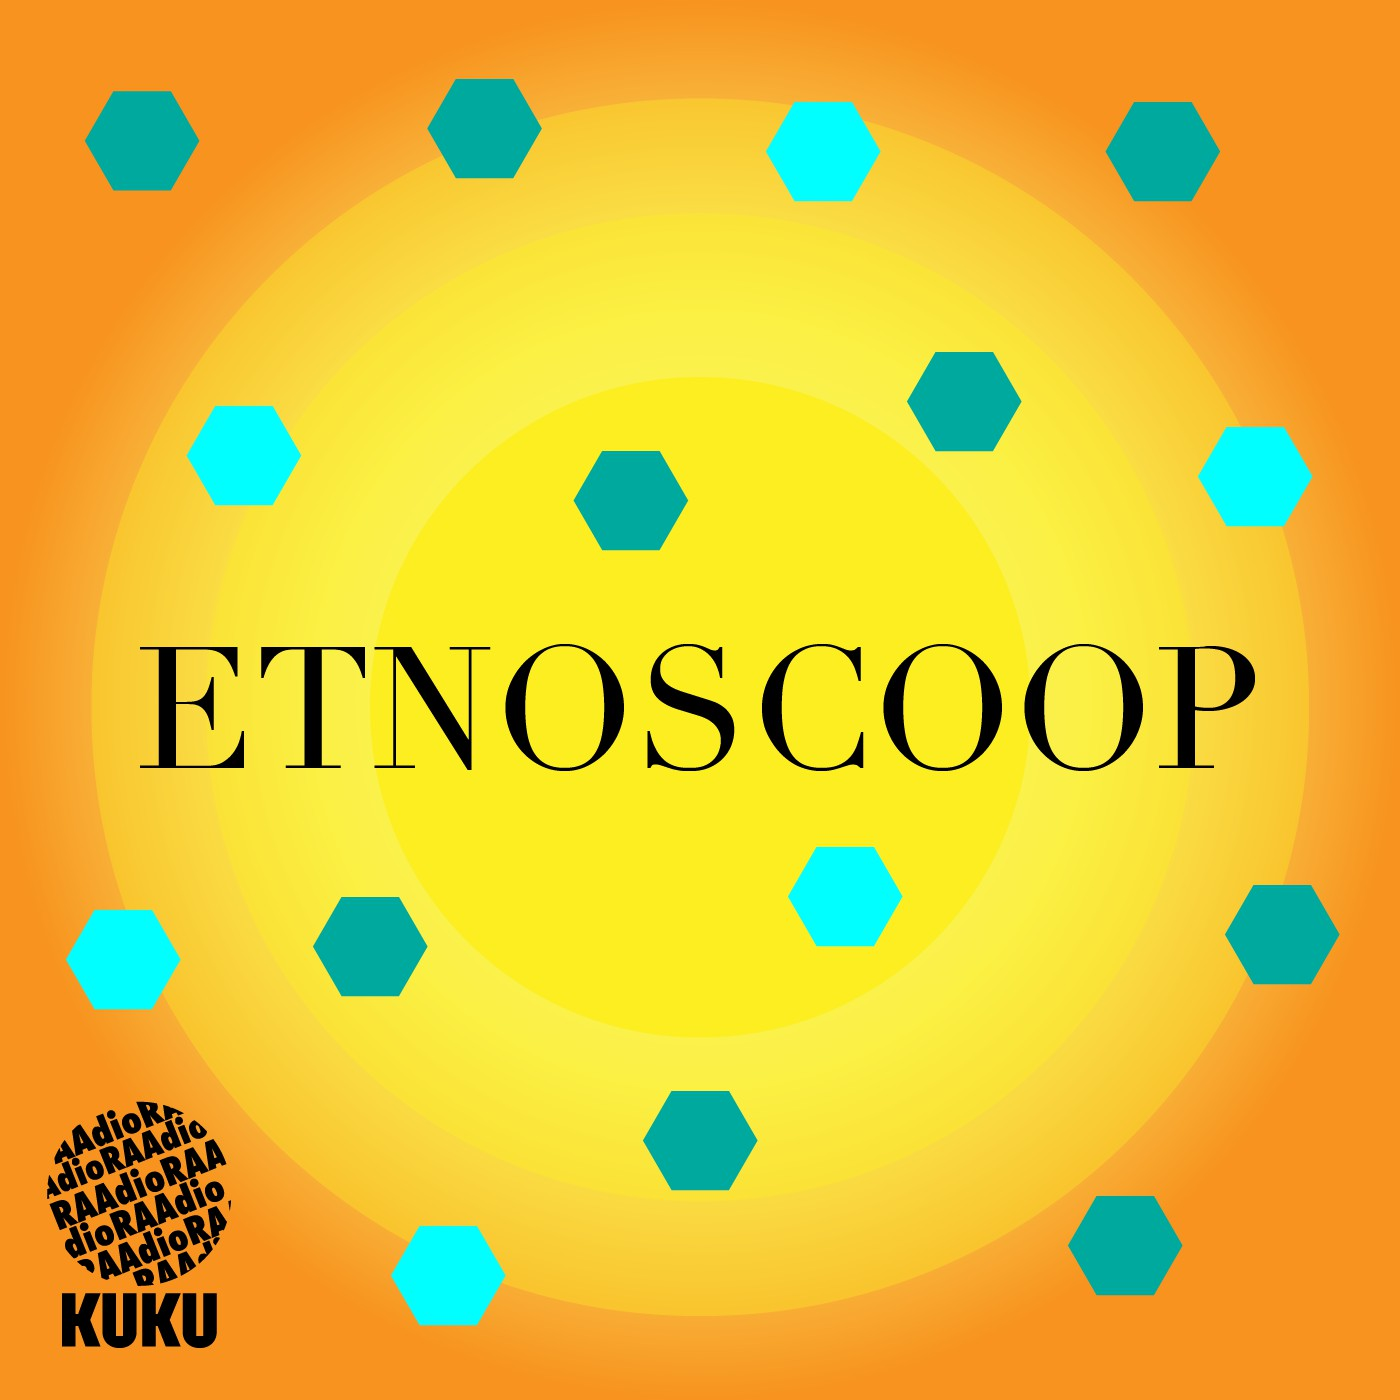 Etnoscoop